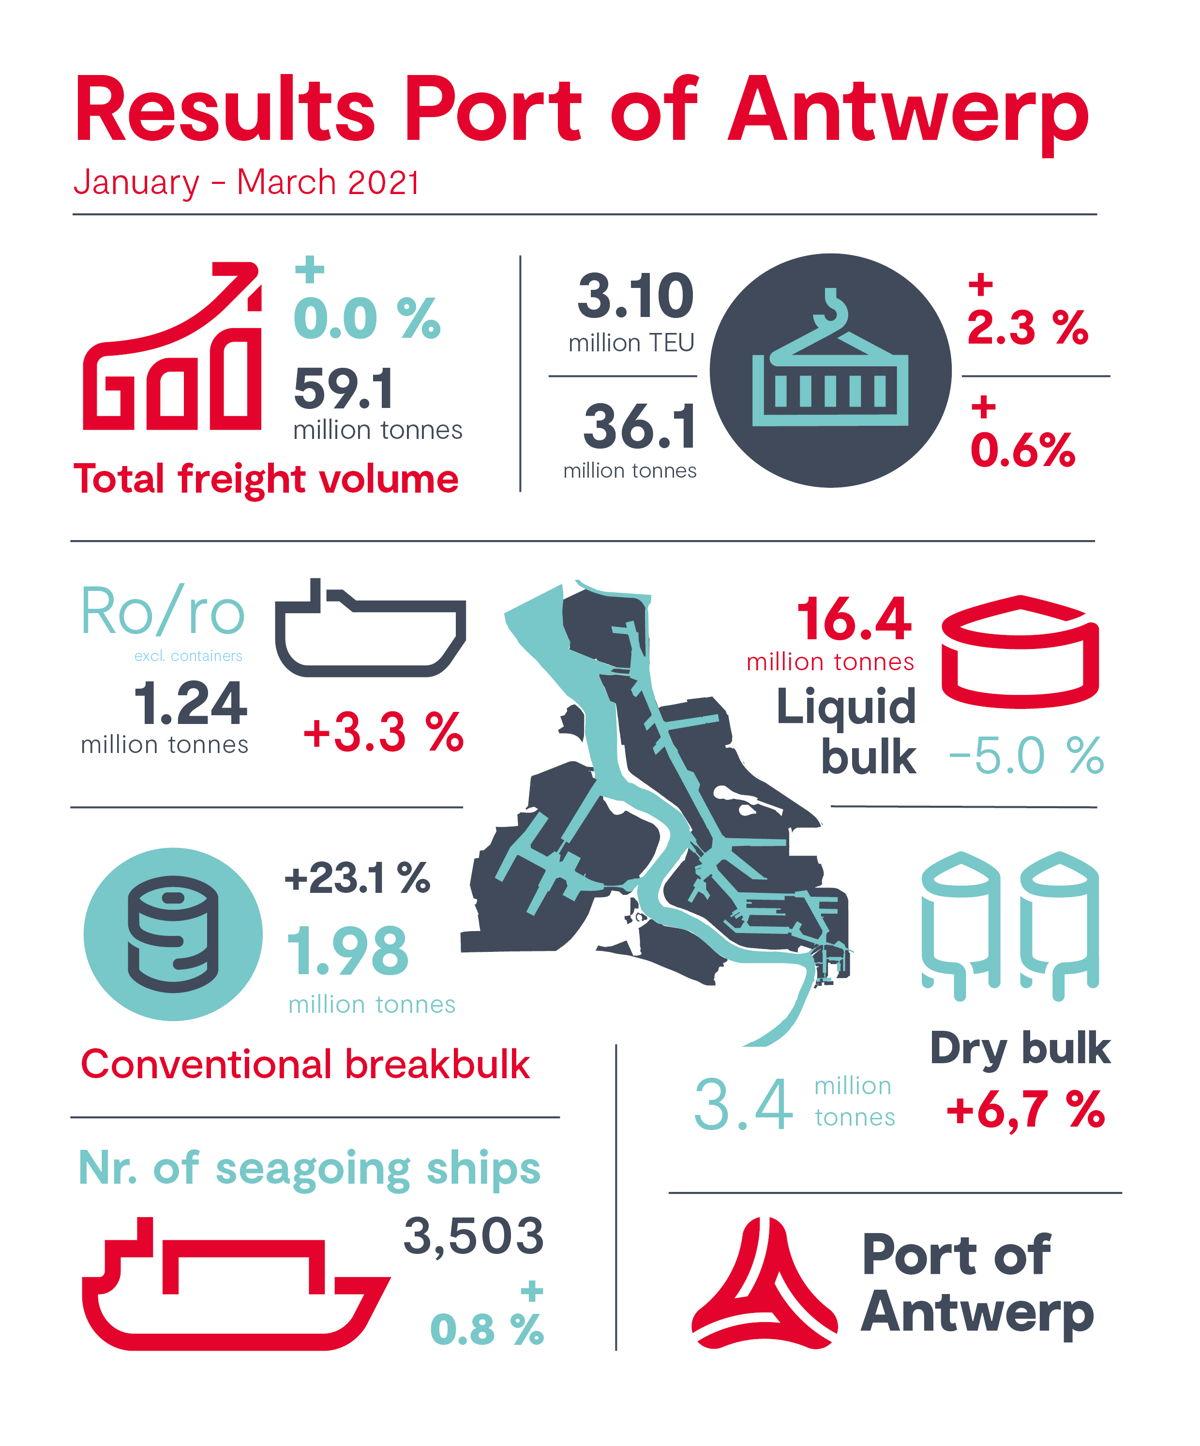 Results Port of Antwerp Q1 2021